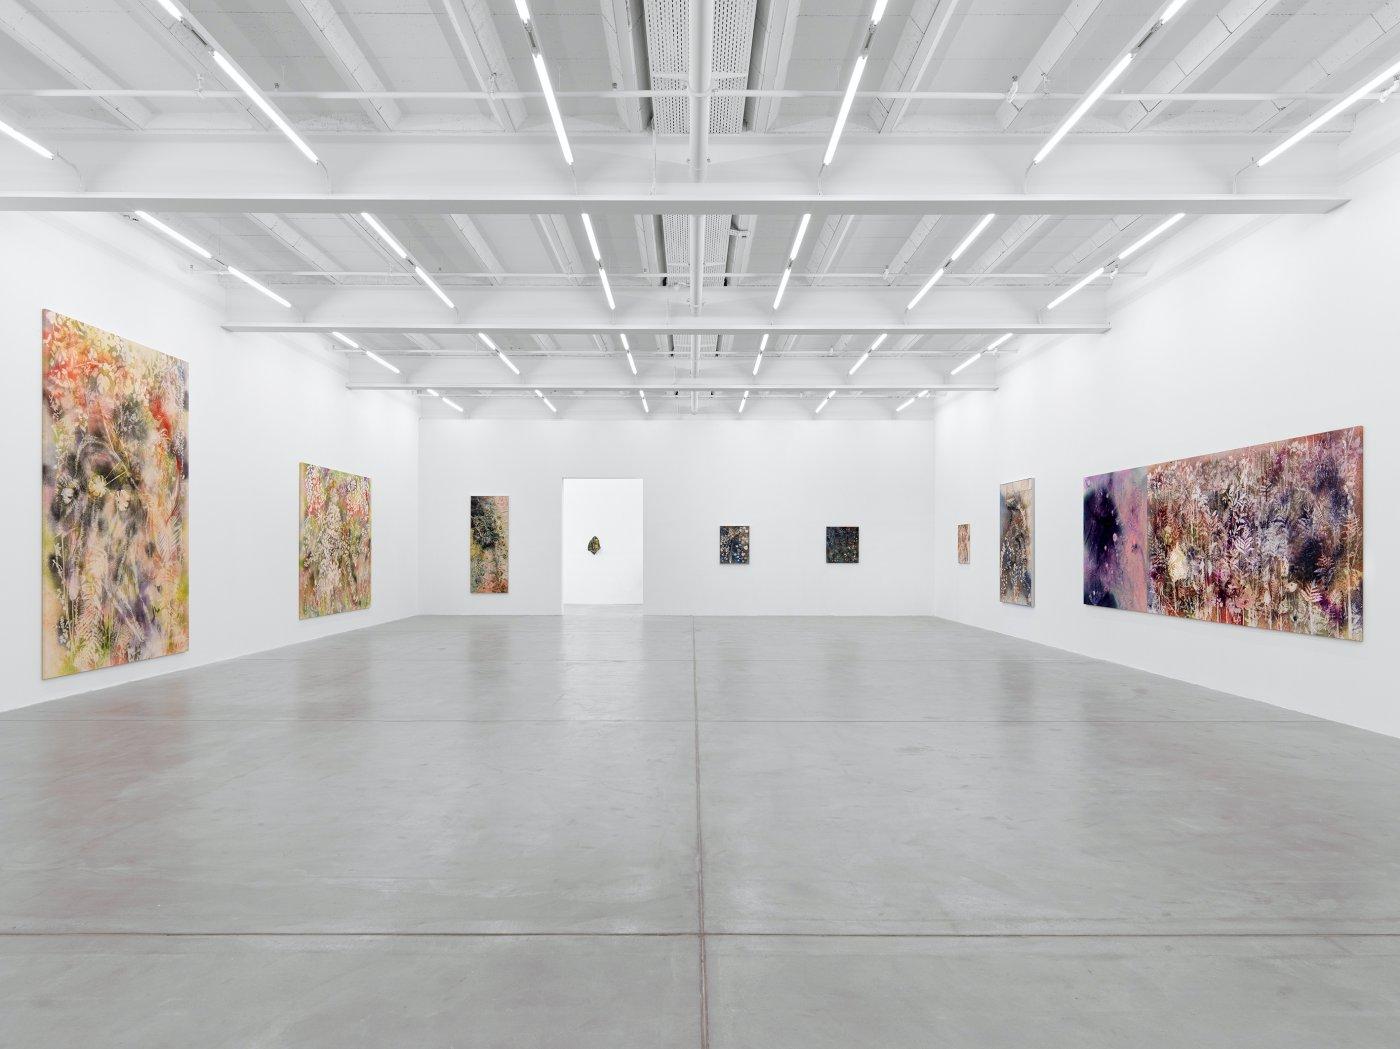 Galerie Eva Presenhuber Maag Areal Sam Falls 6